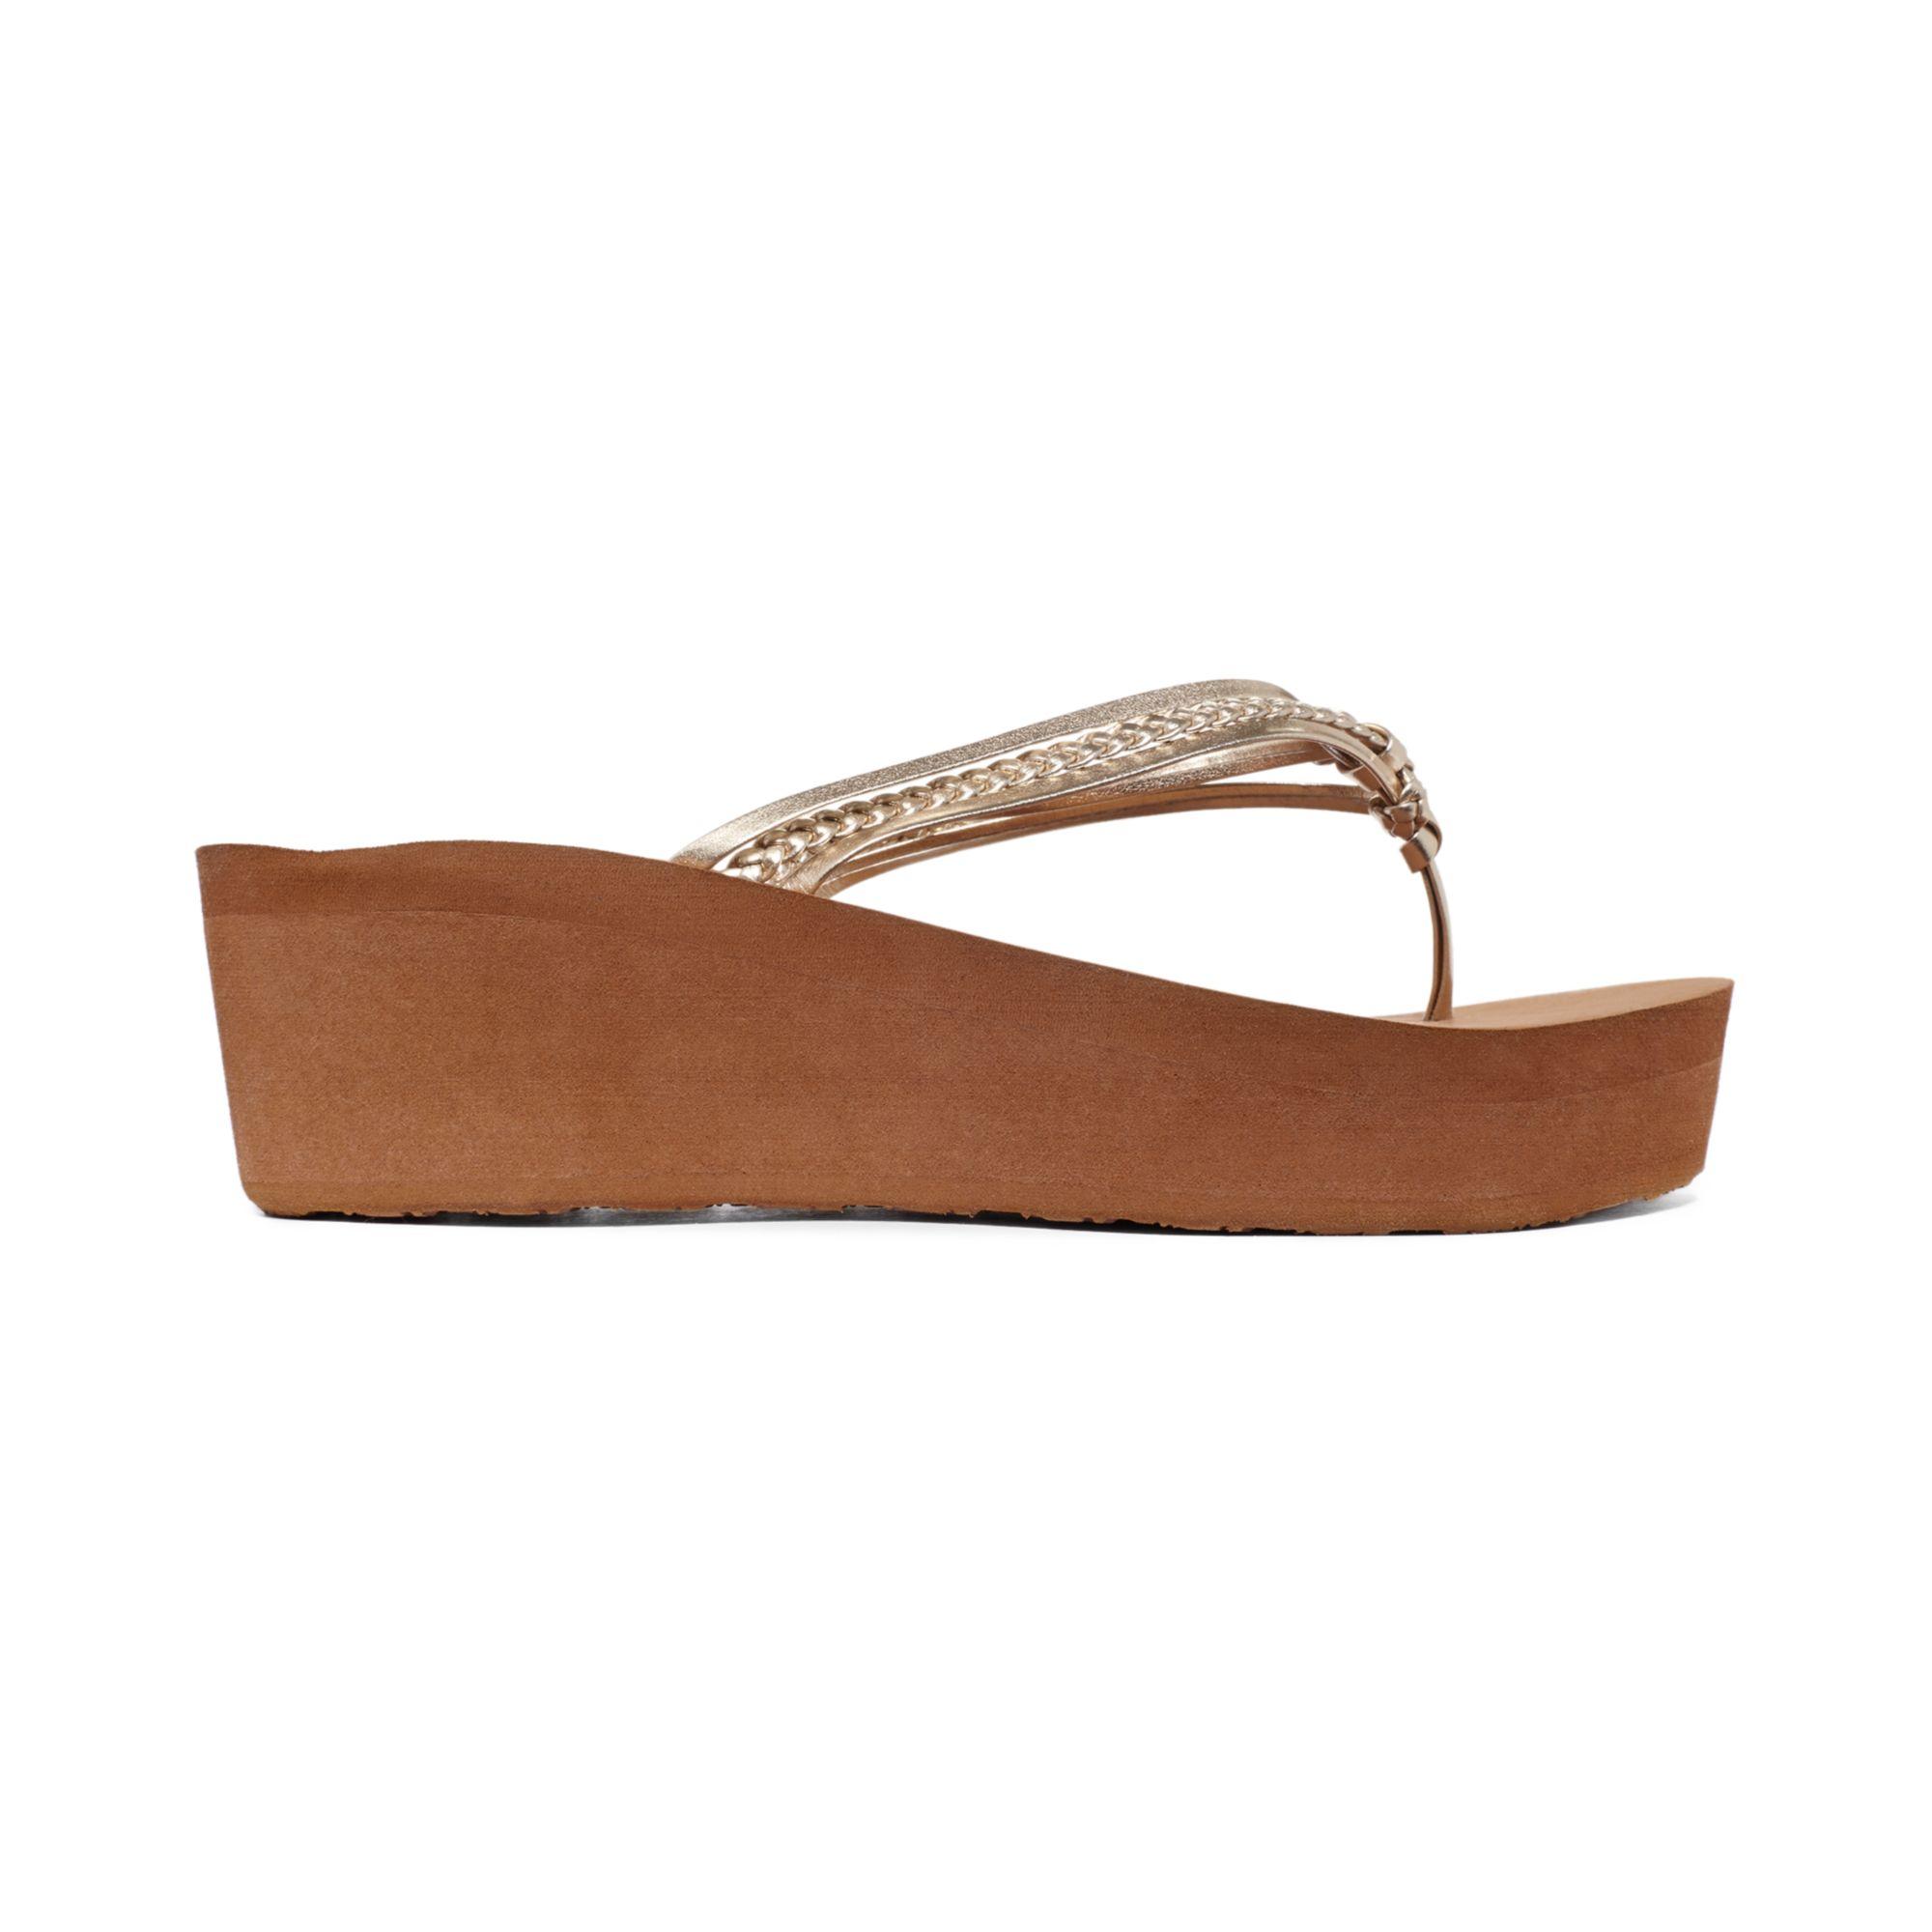 67142d5c3d3 Lyst - Roxy Puka Platform Wedge Thong Sandals in Metallic